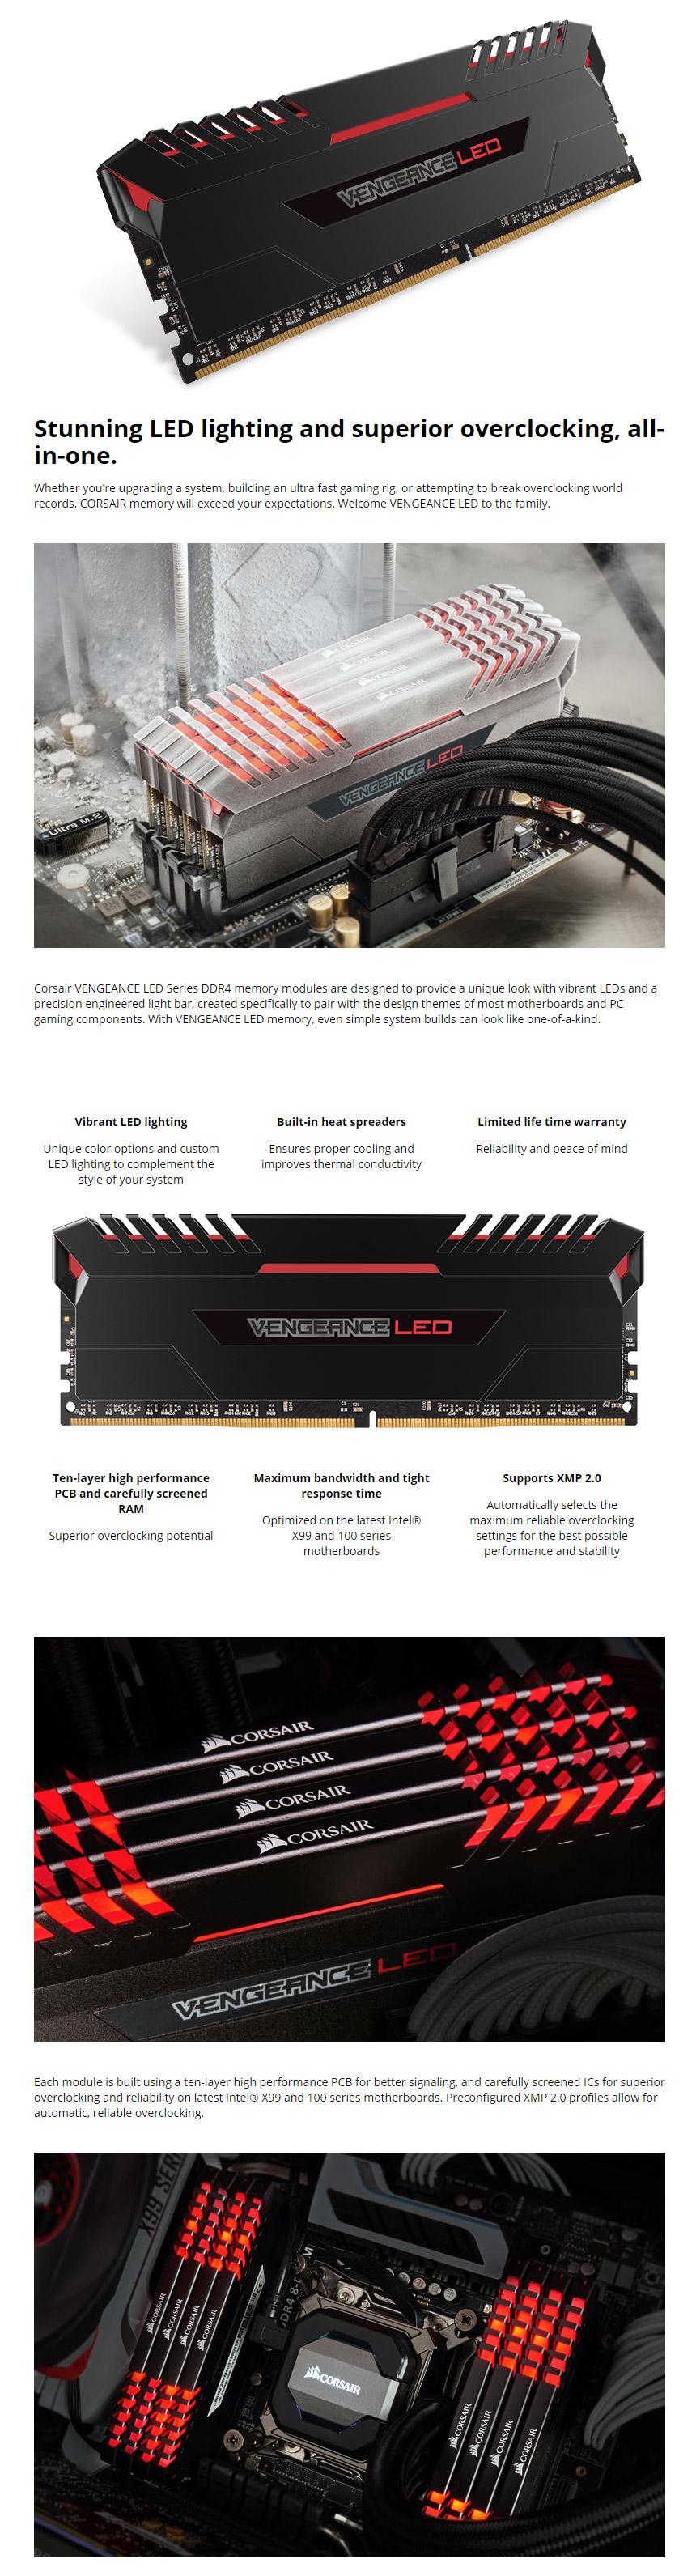 Corsair Cmu16gx4m2c3200c16r Memory Page 4 519 Products Ddr4 Vengeance Led Pc25600 16gb 2x8gb Red